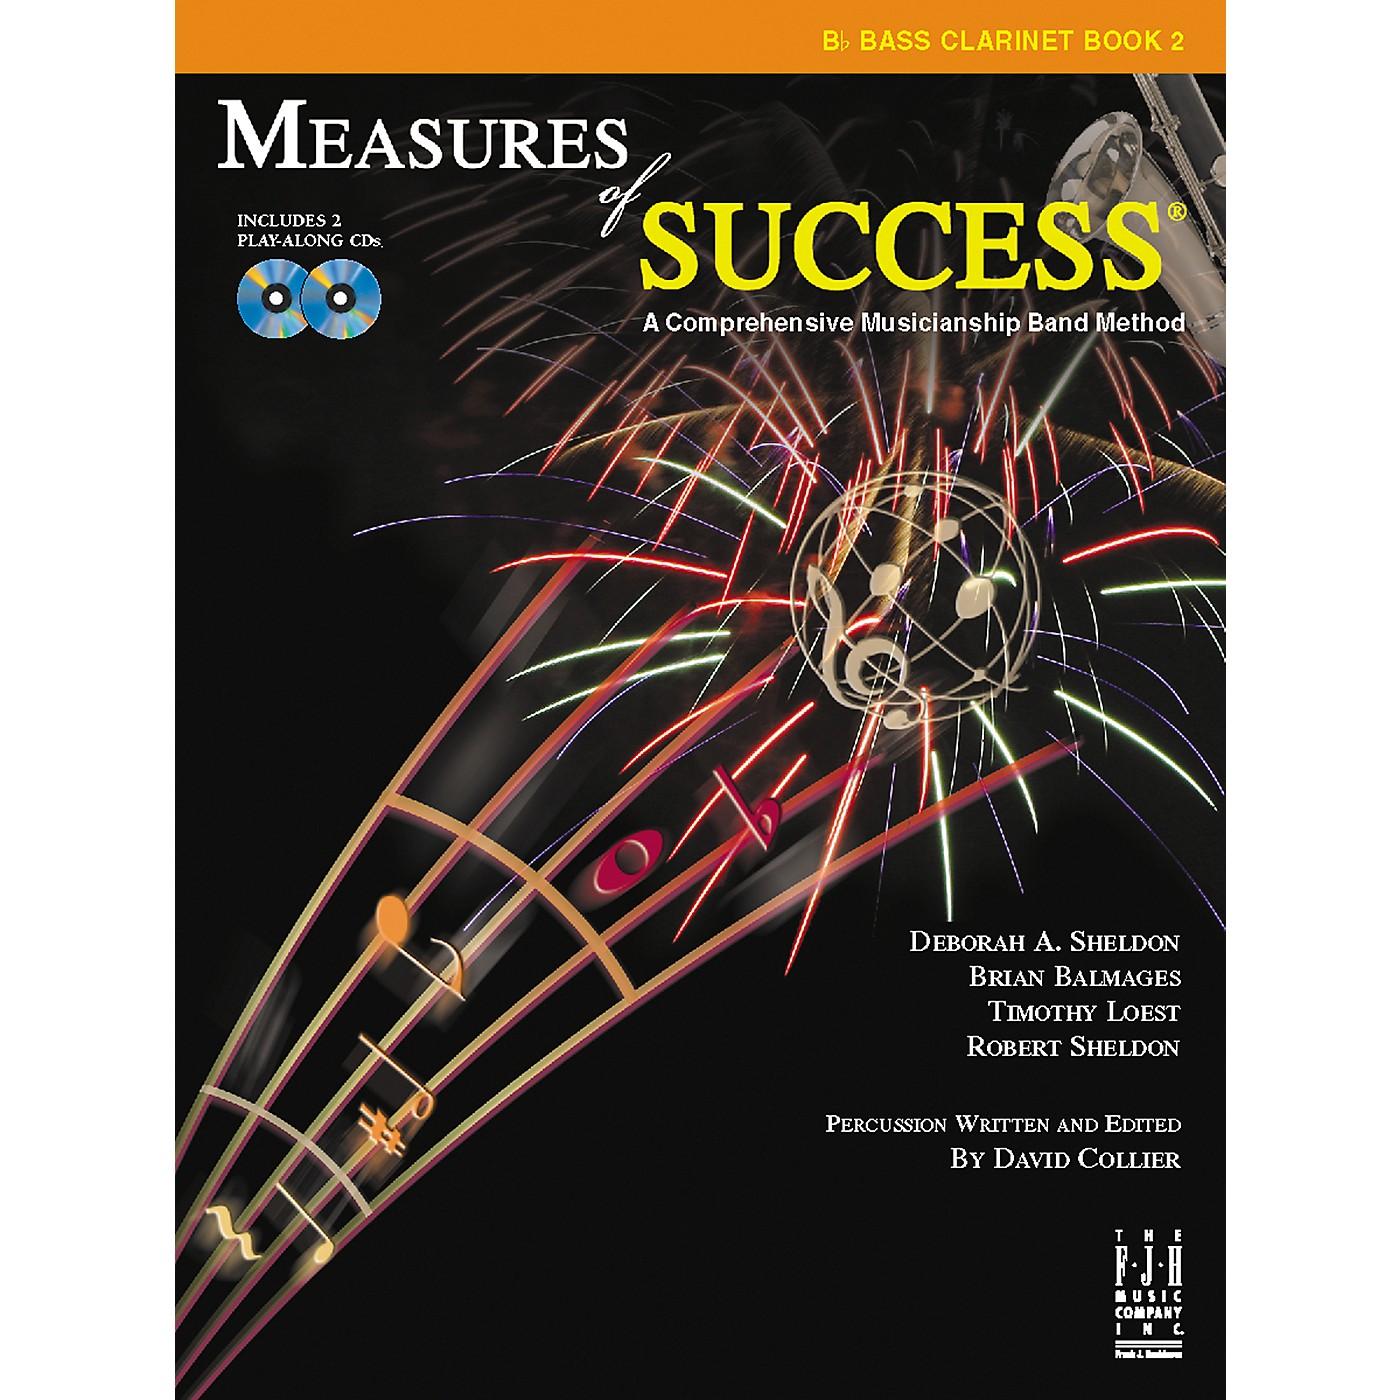 FJH Music Measures of Success Bass Clarinet Book 2 thumbnail